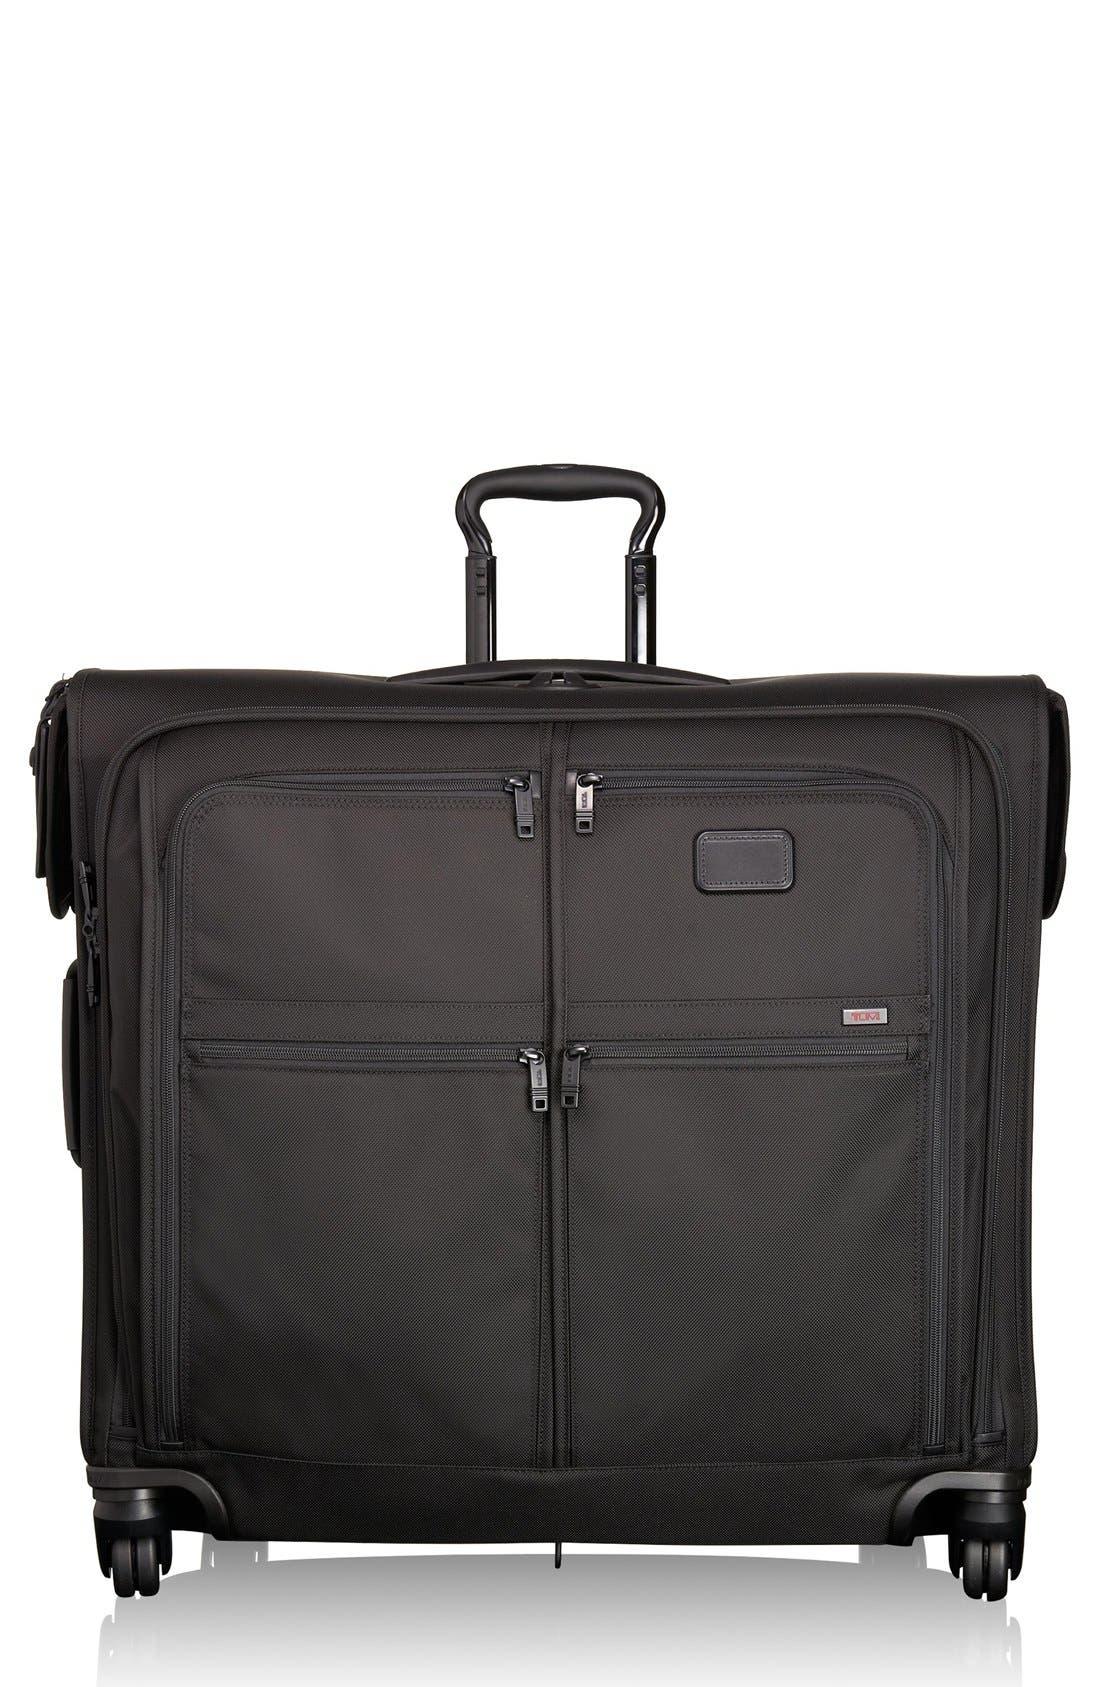 Tumi 'Alpha 2' Extended Trip Wheeled Garment Bag